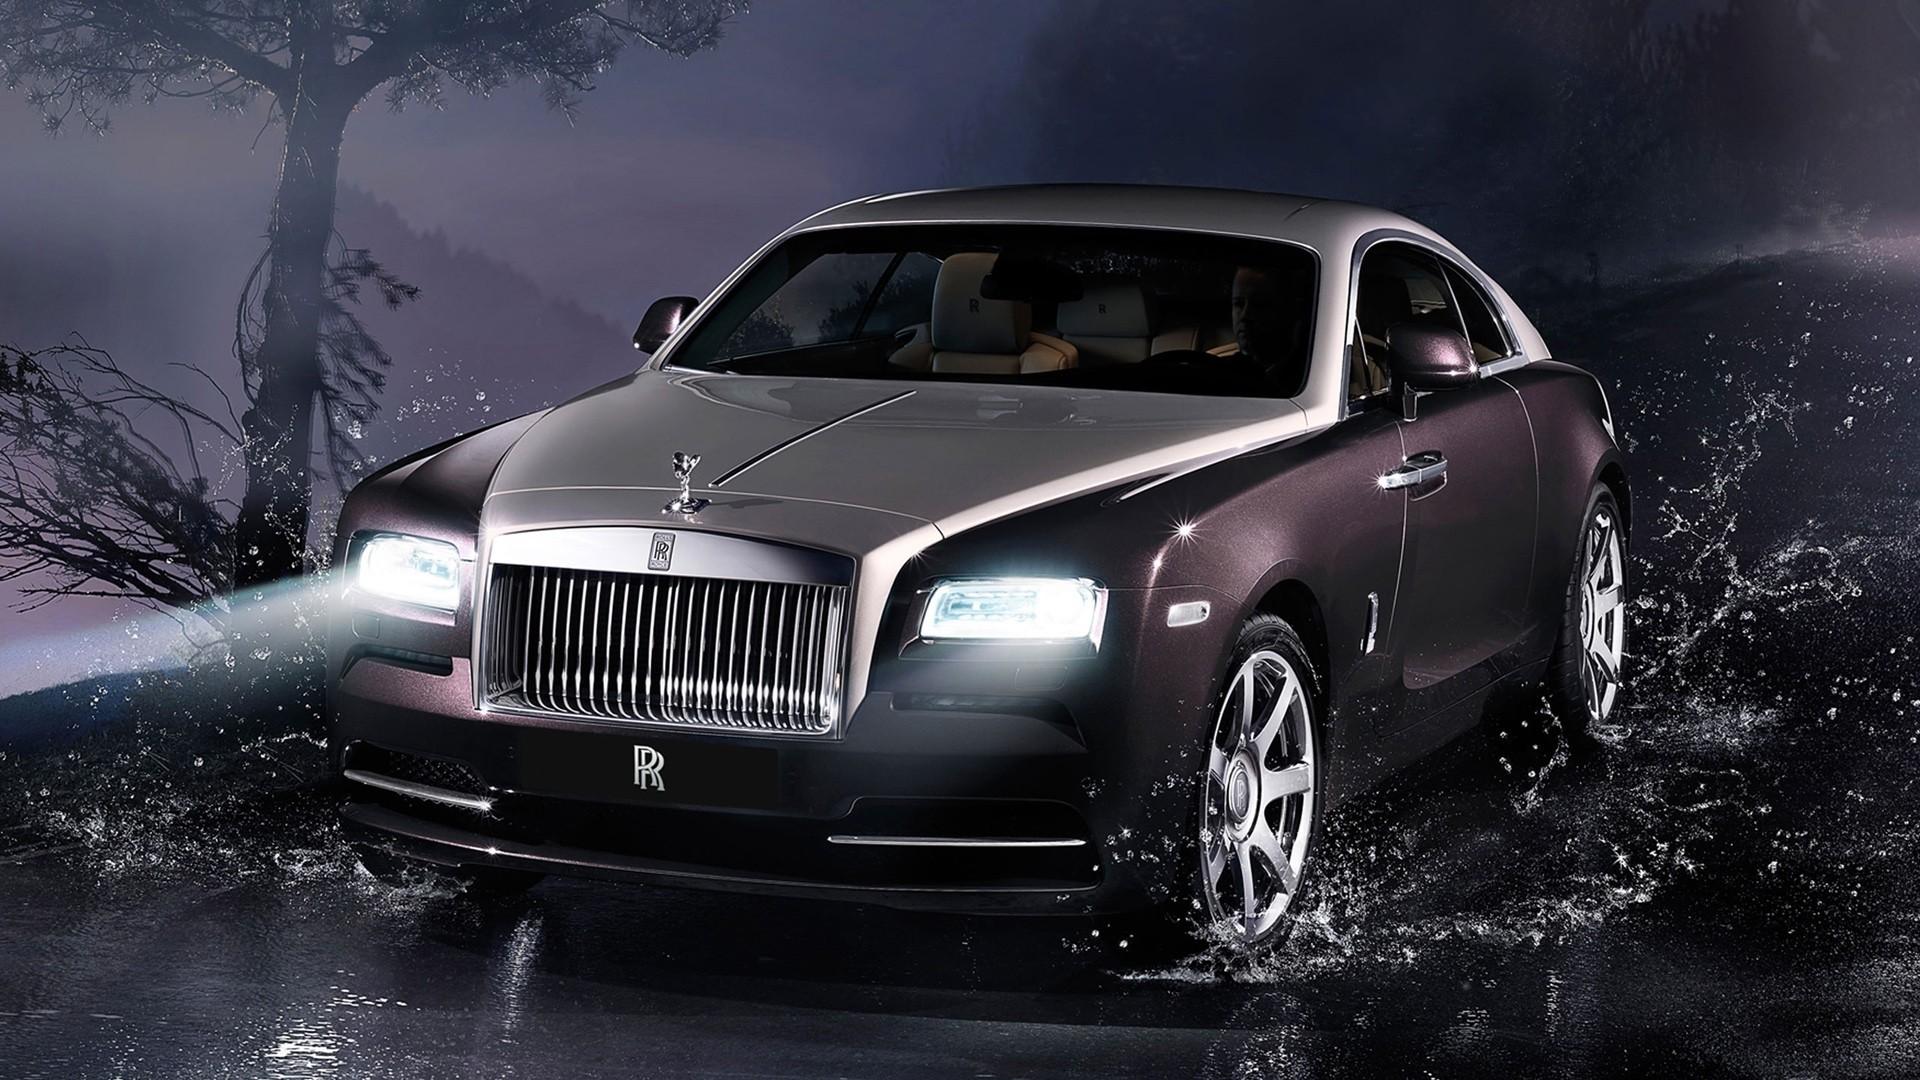 Rolls Royce Wraith Wallpaper for pc